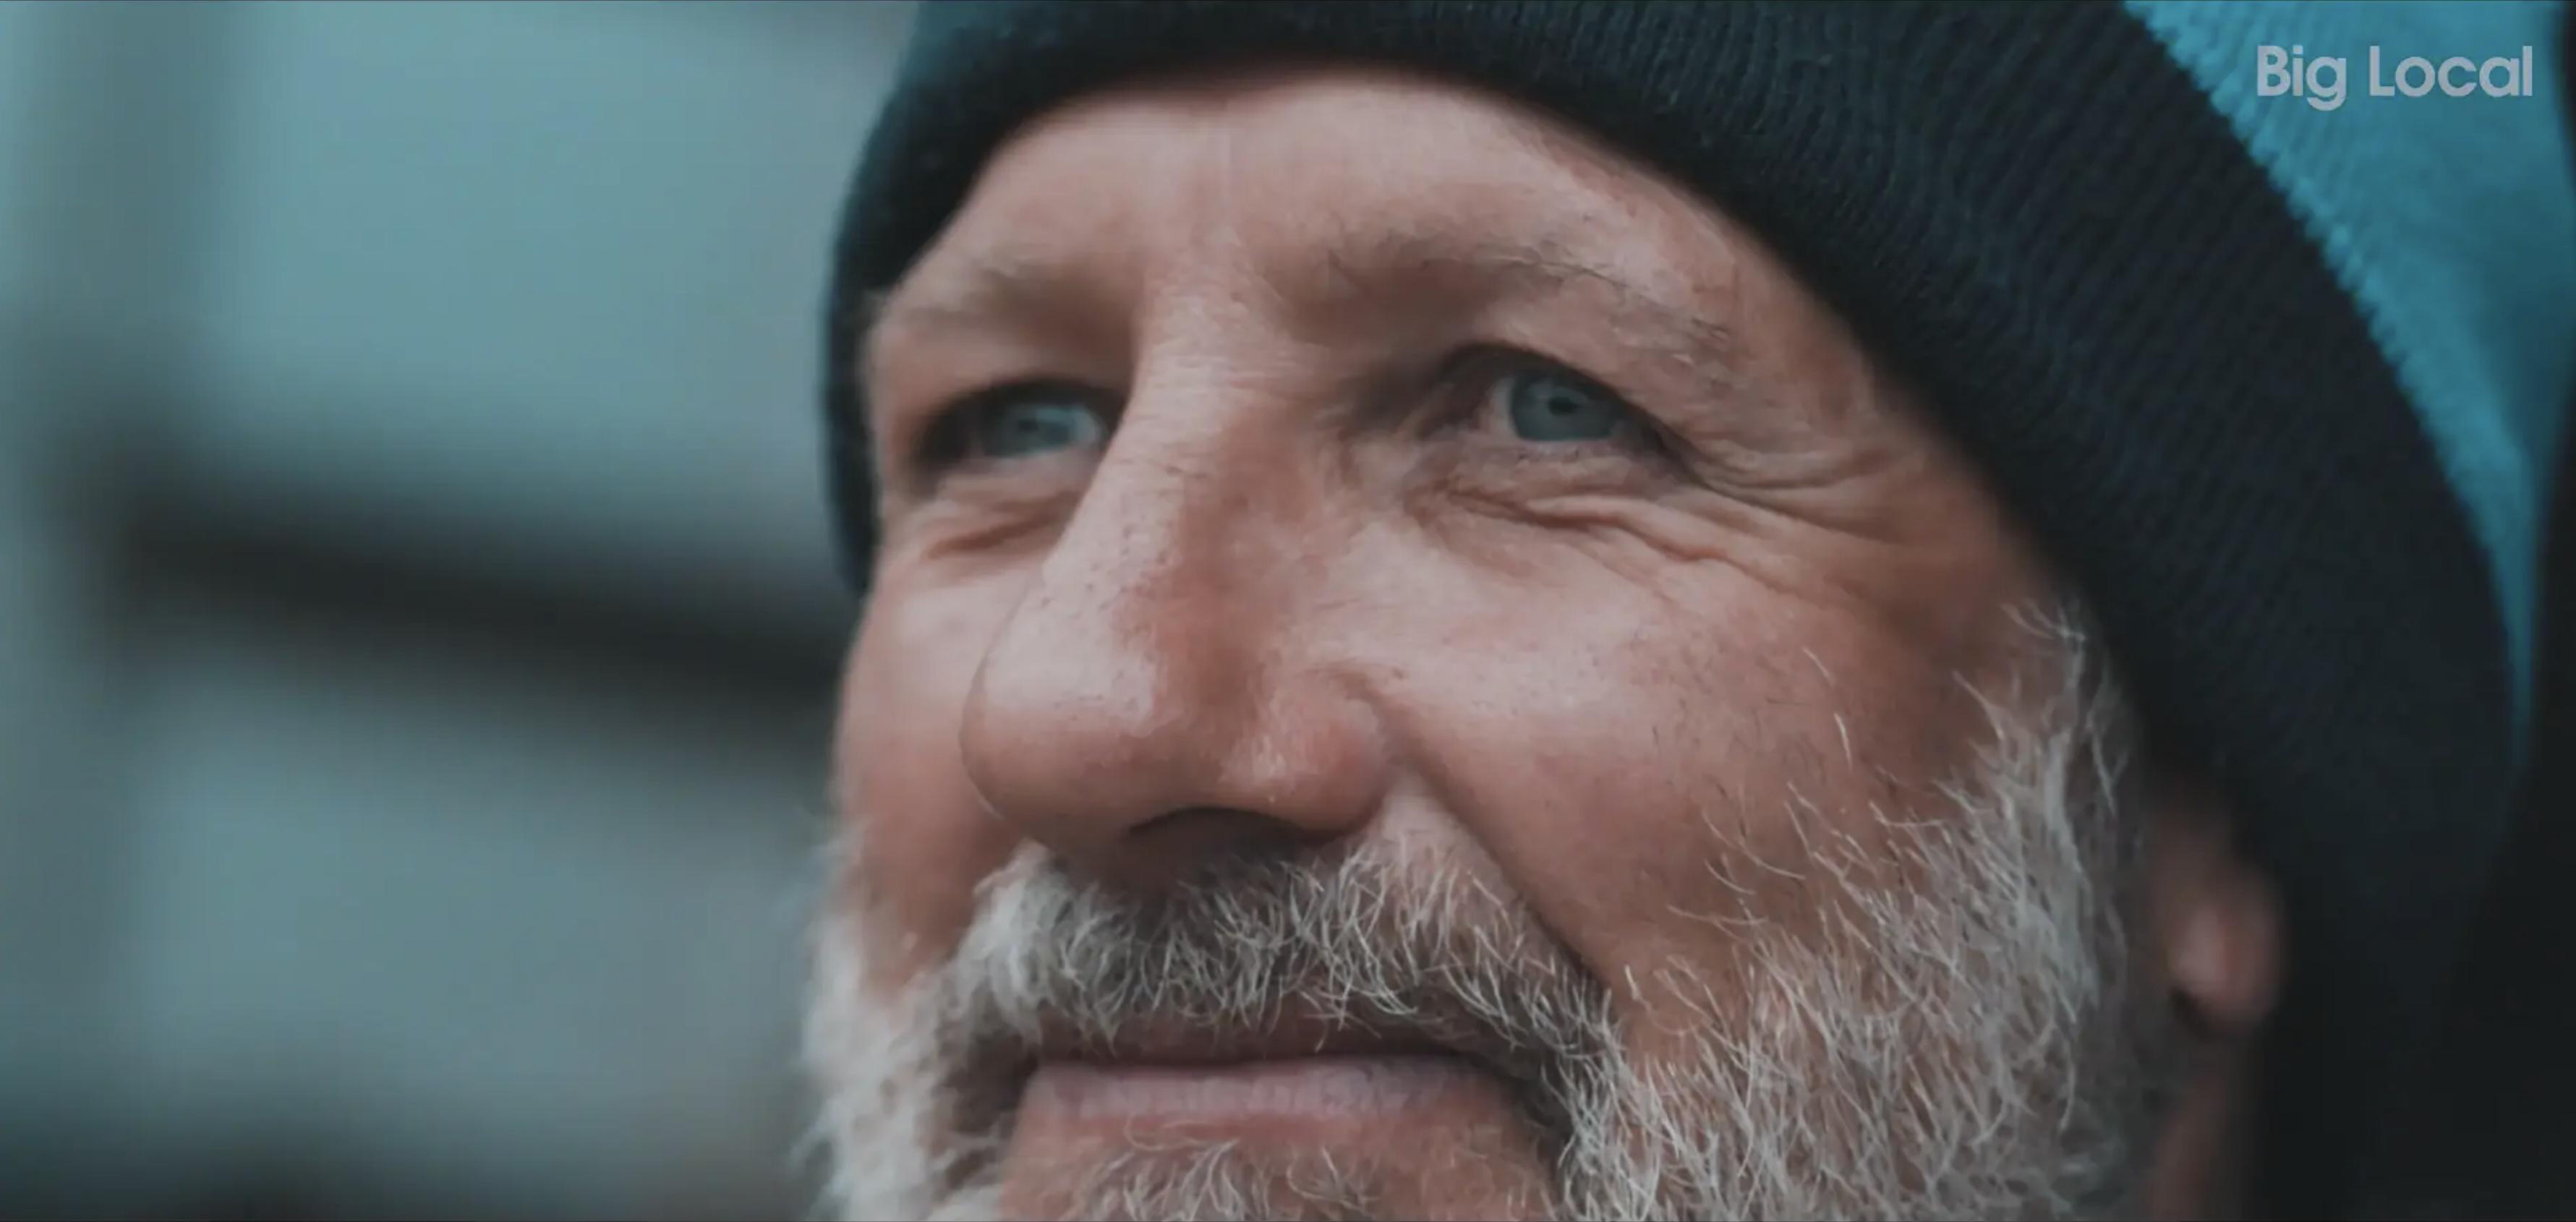 Charity video roundup 2019